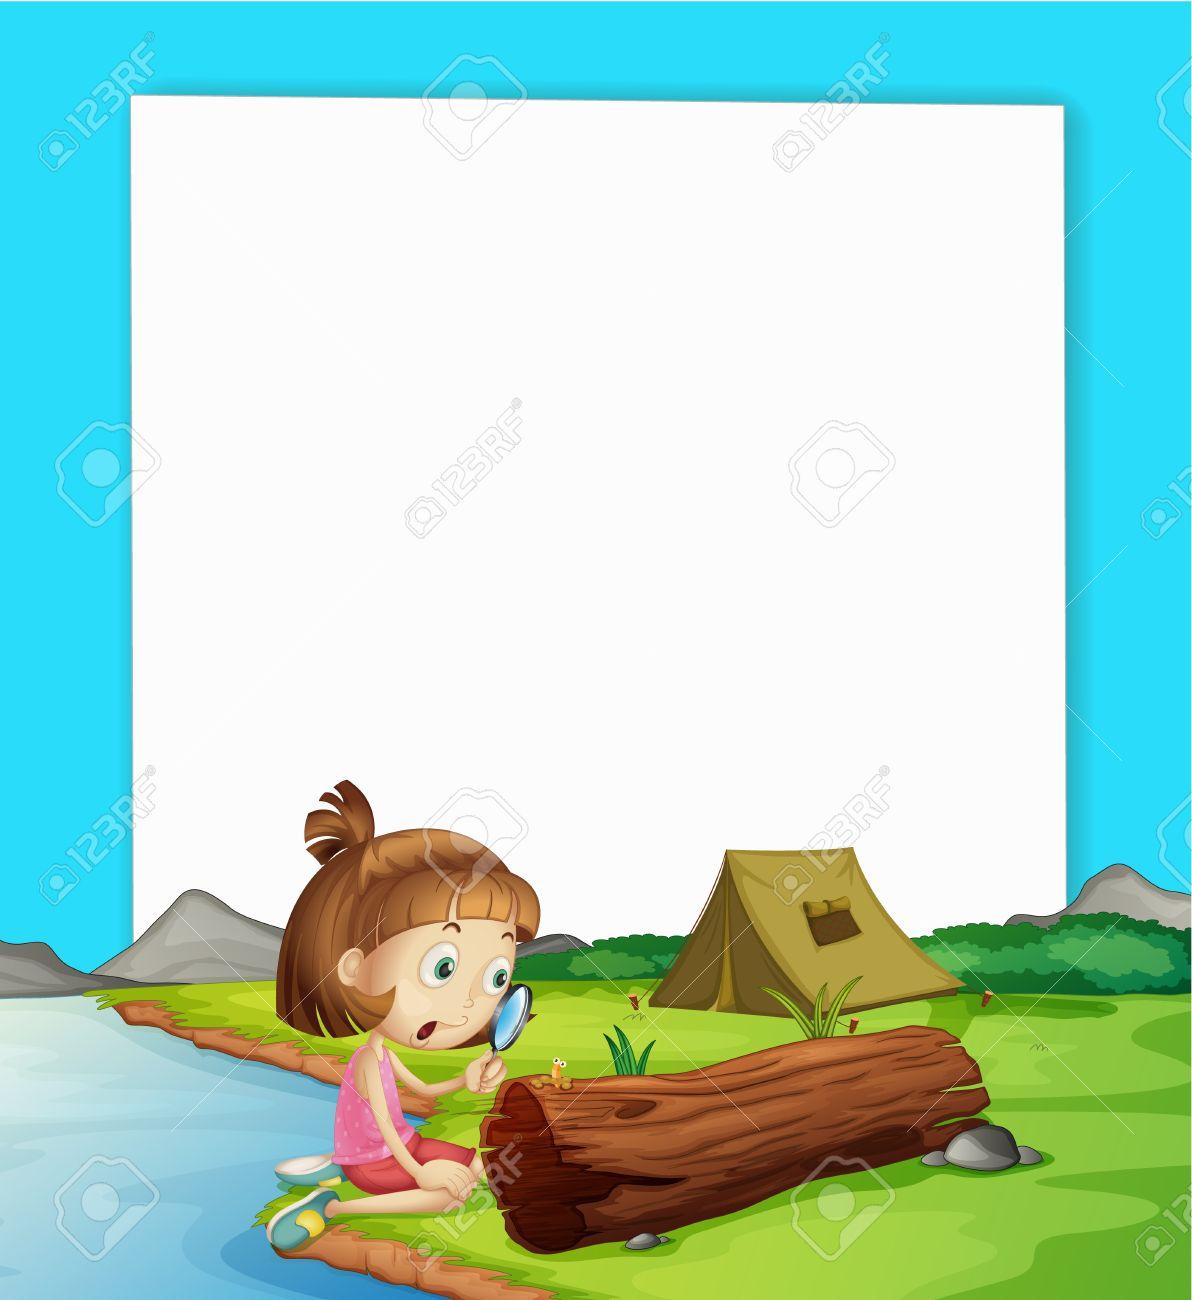 Illustration of camping paper scene Stock Vector - 13635821